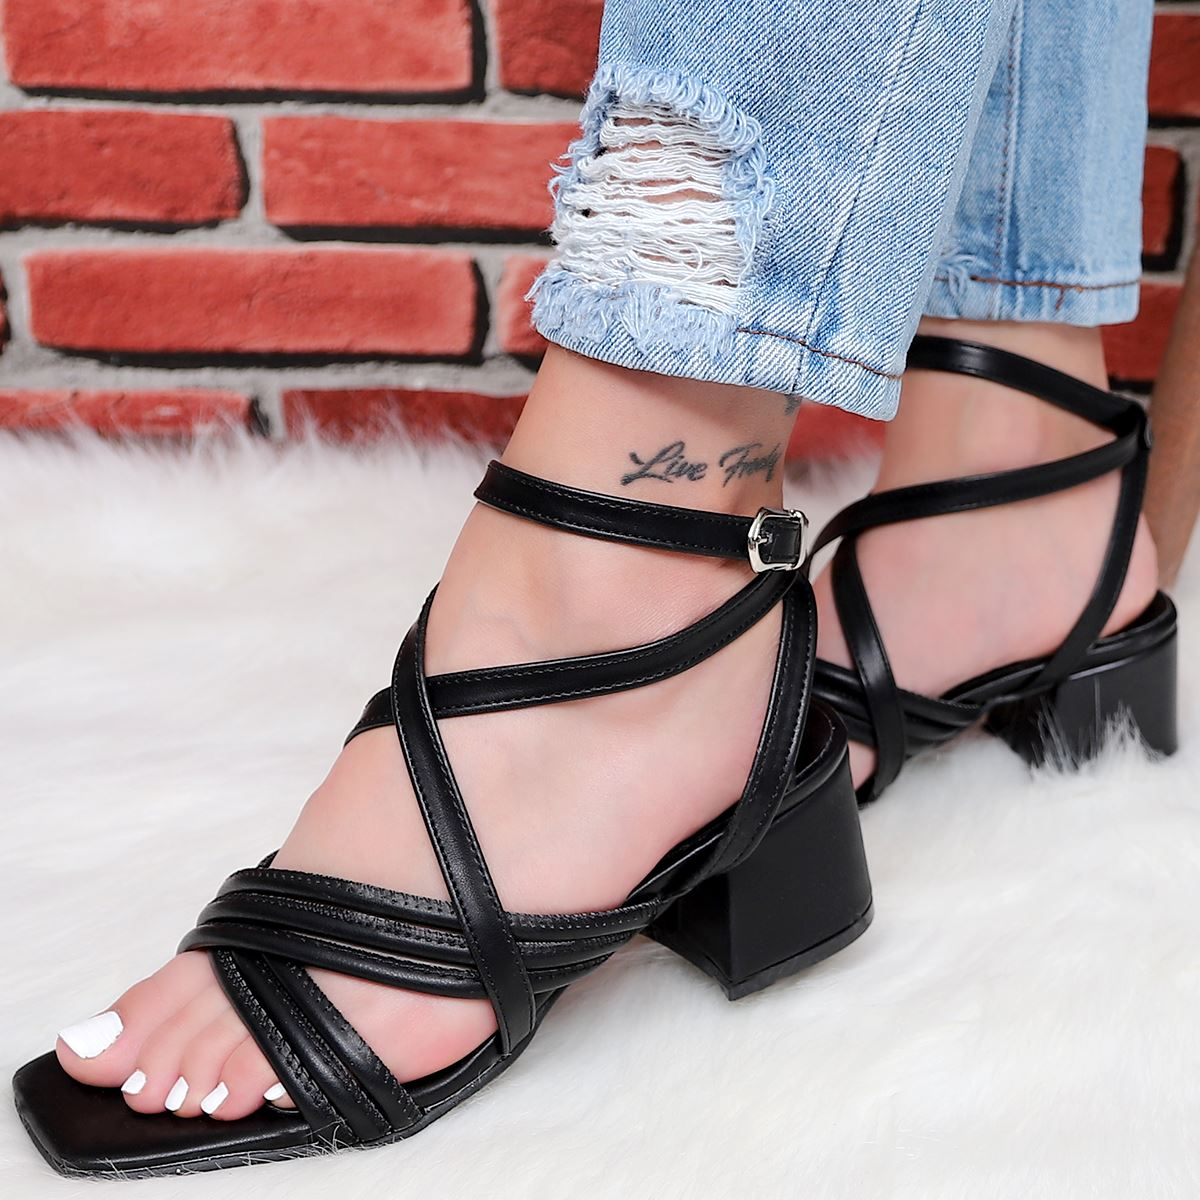 Siyah Çapraz Bantlı Topuklu Sandalet SND171